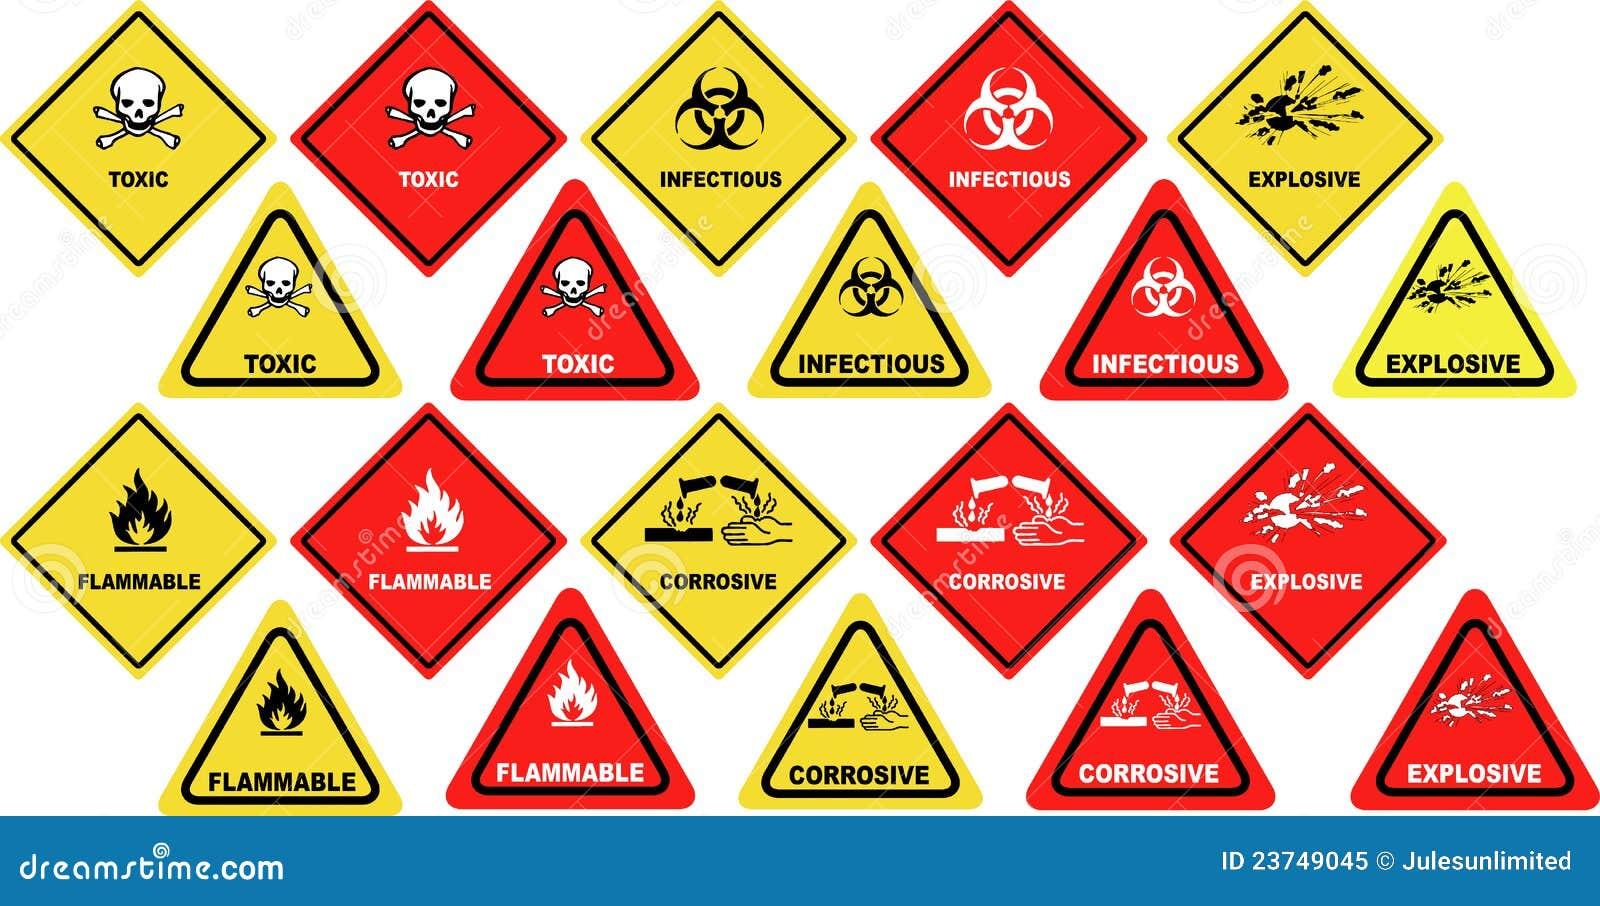 Dangerous Goods Warning Signs Vector Stock Vector Illustration